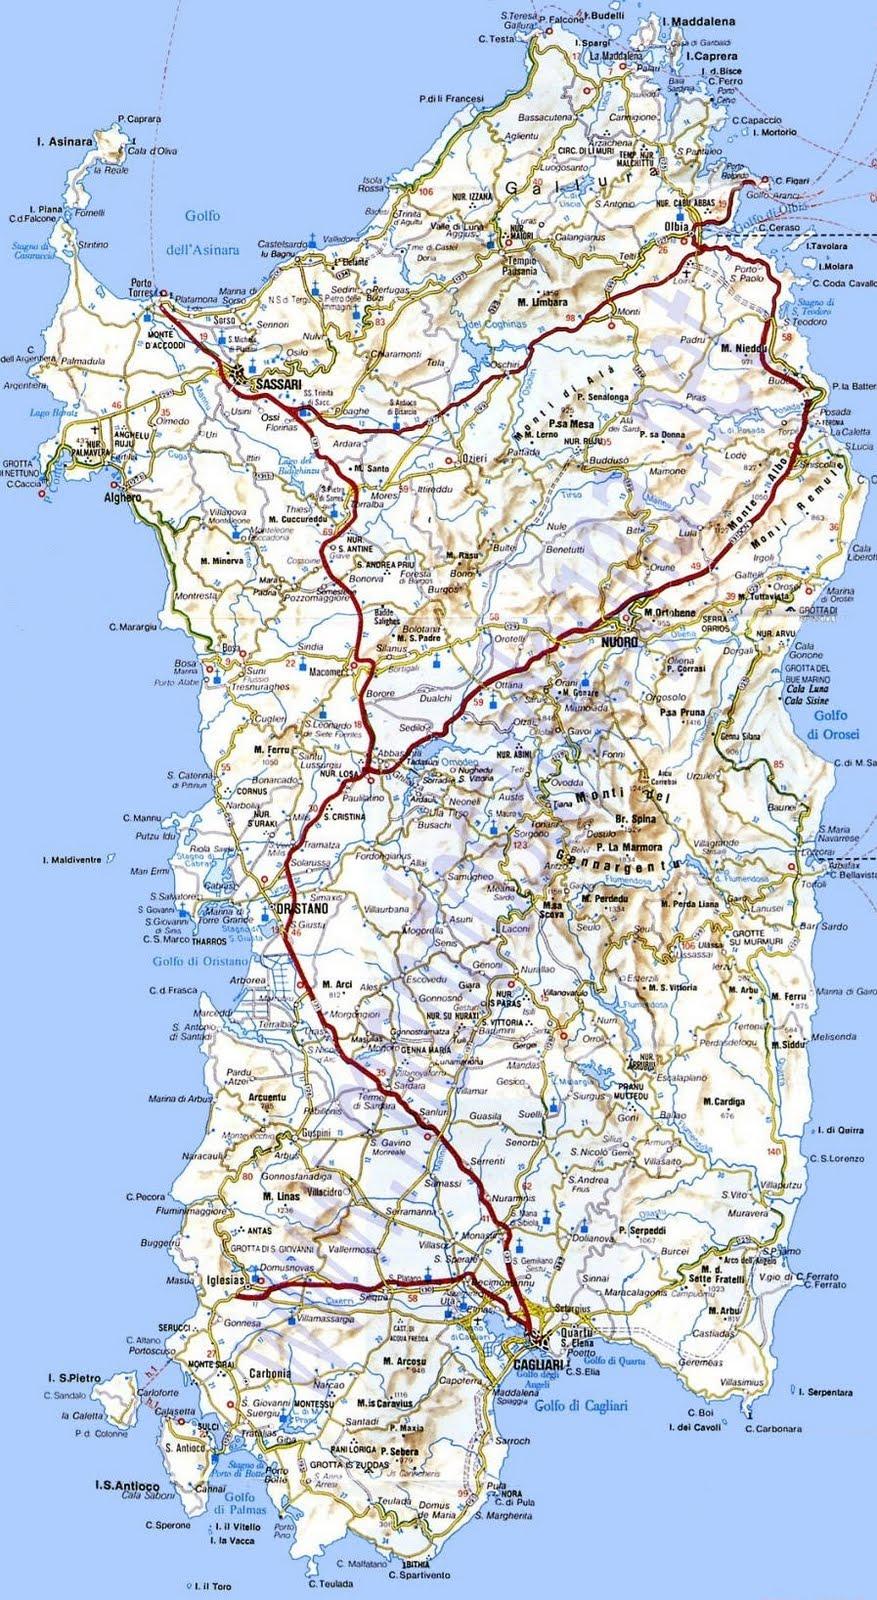 Cartina Sardegna Pula.Google Maps Europe Mappa D Sardegna Isola Immagini